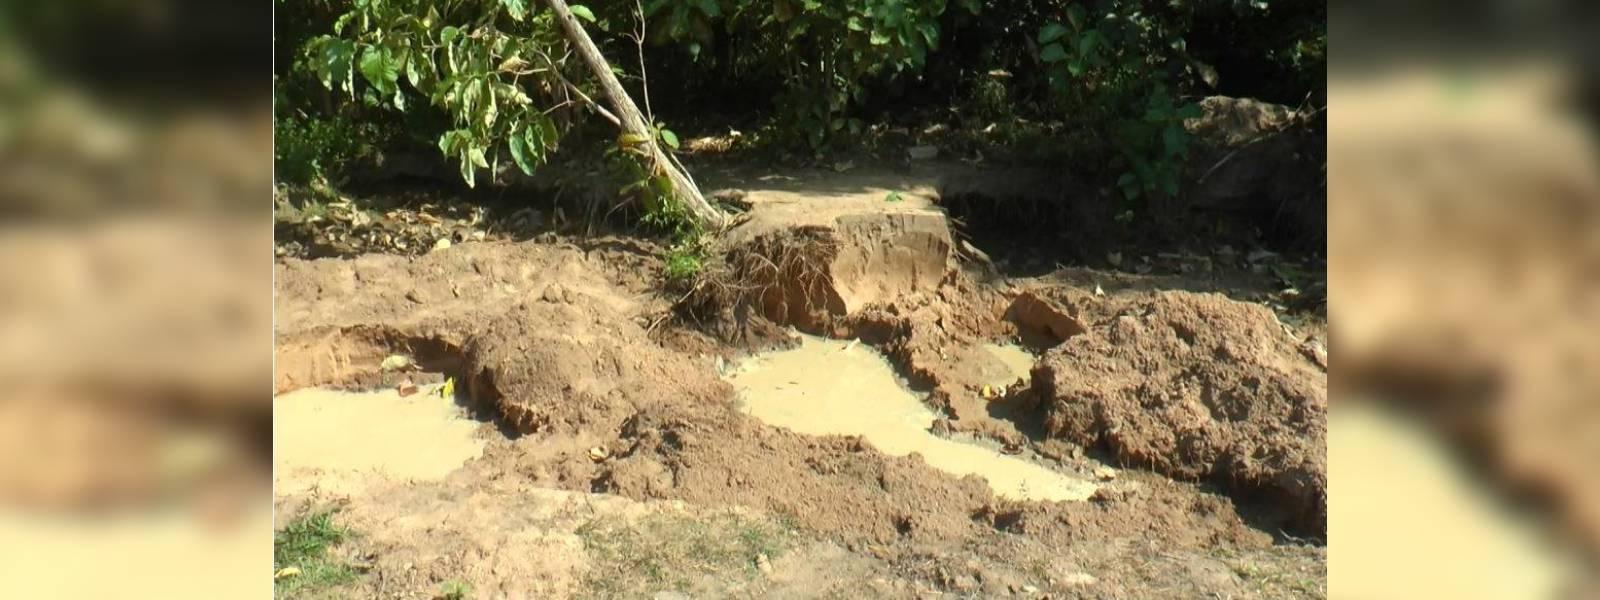 Sand mining in Anamaduwa raises concerns